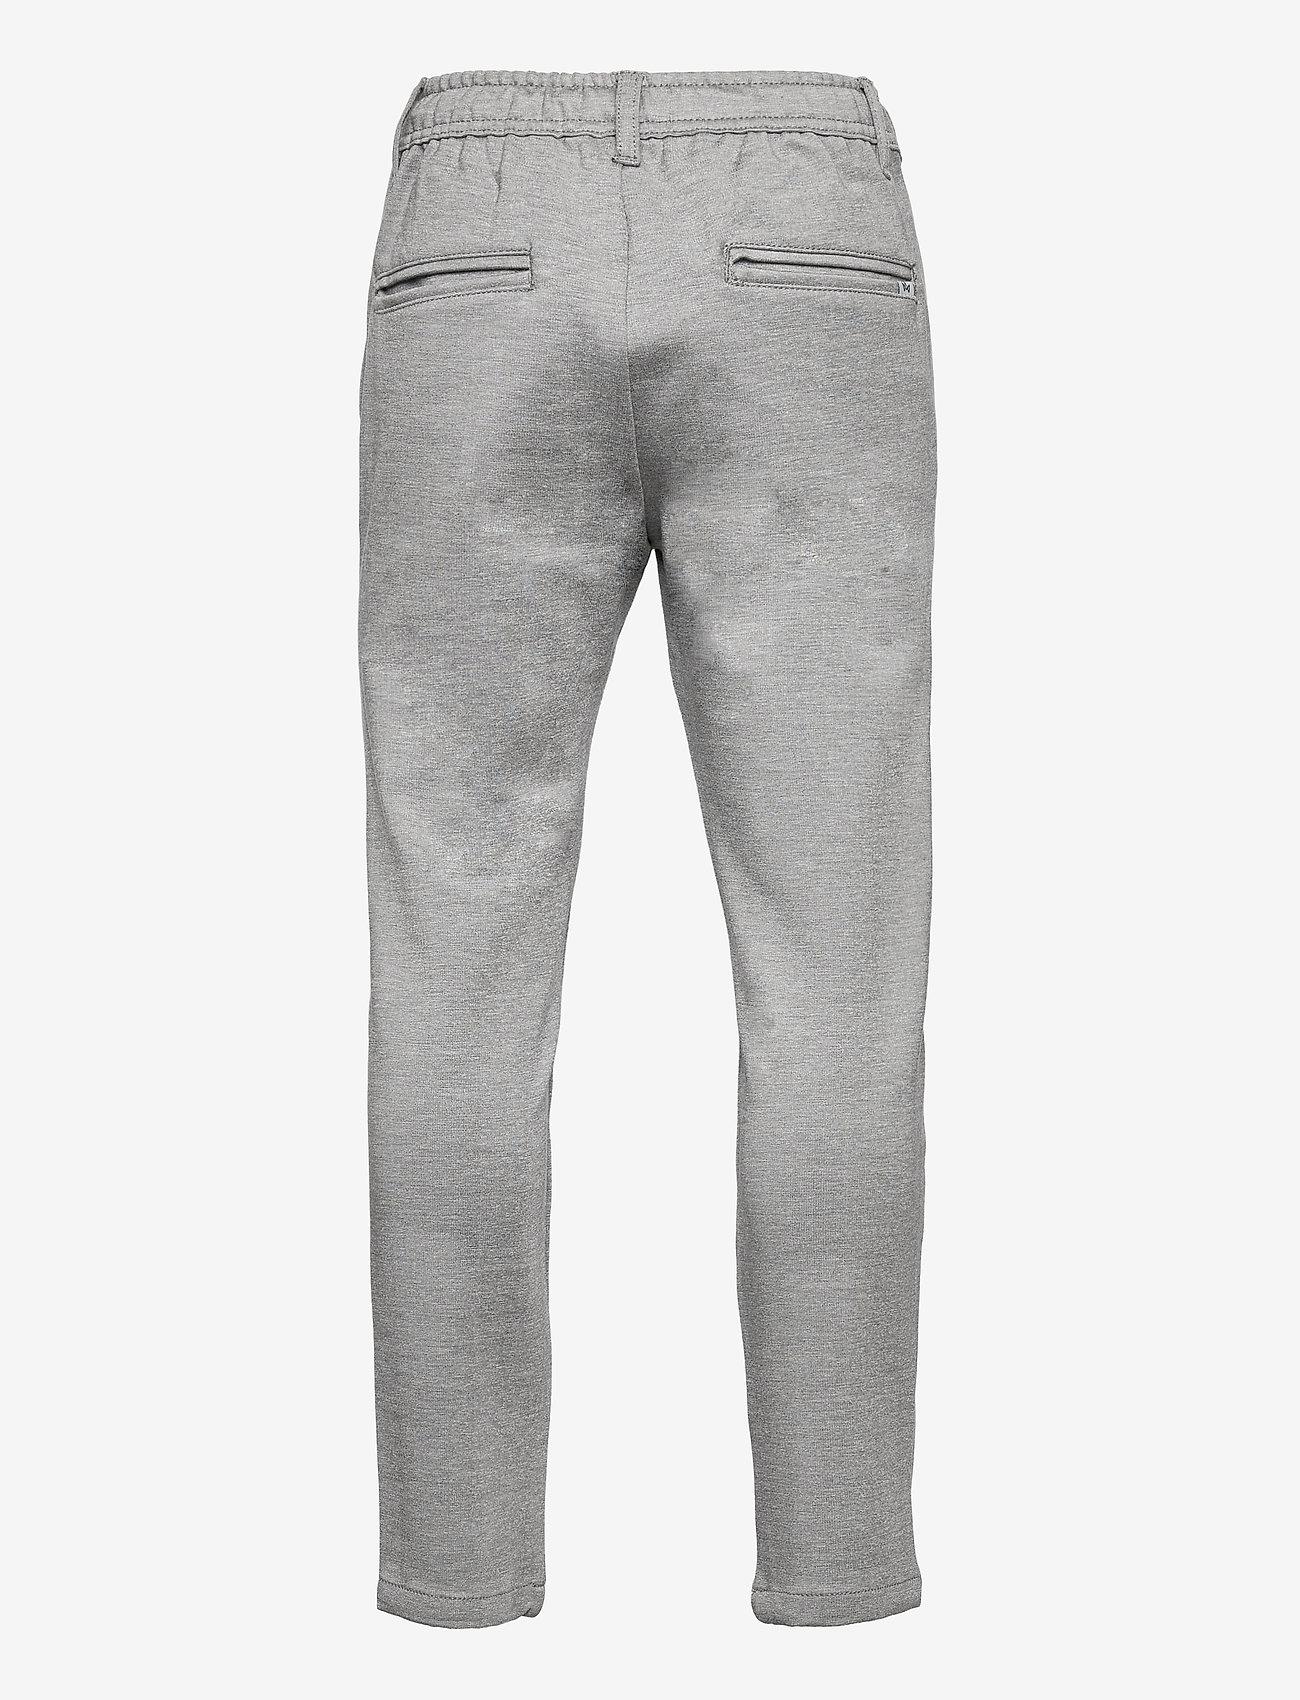 Kronstadt - Club Pants - trousers - light grey - 1